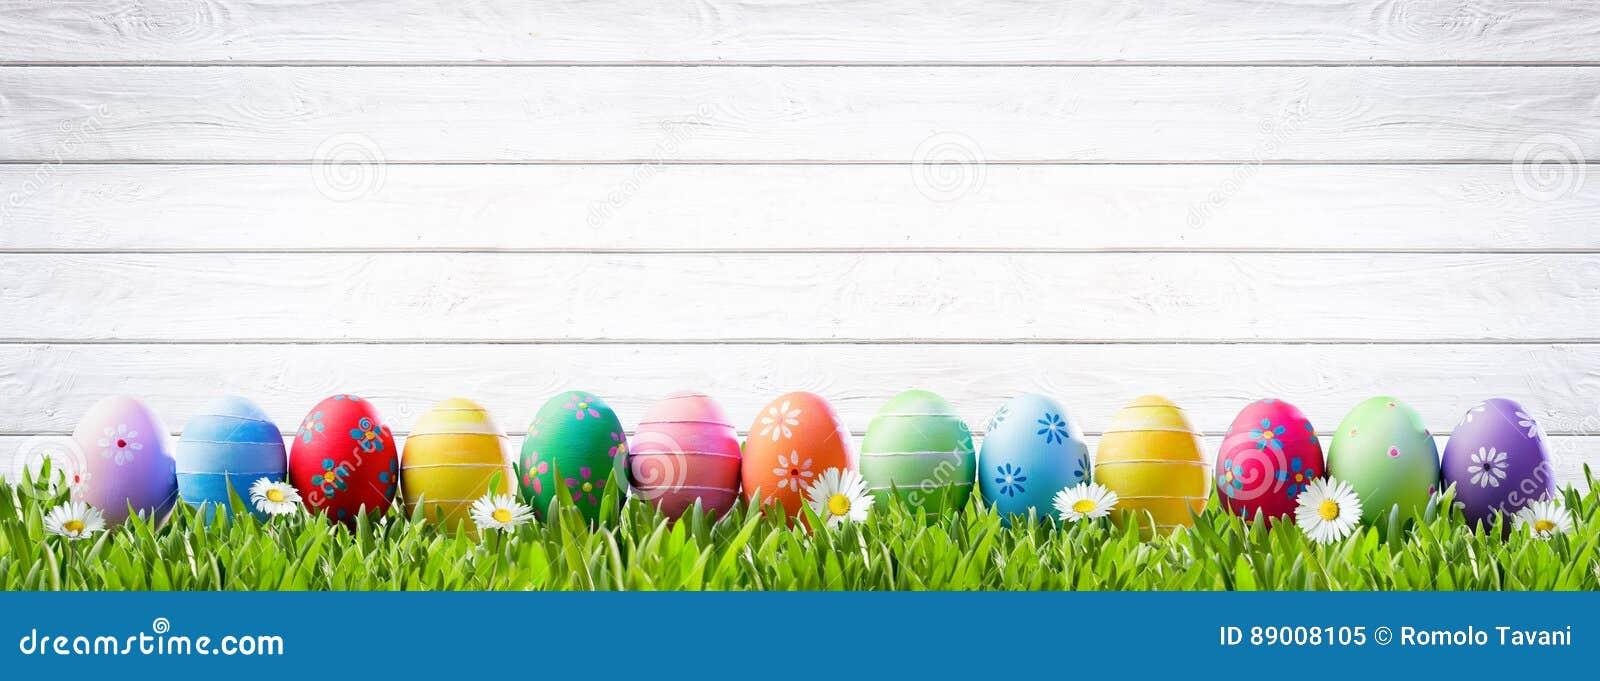 Huevos de Pascua en una fila